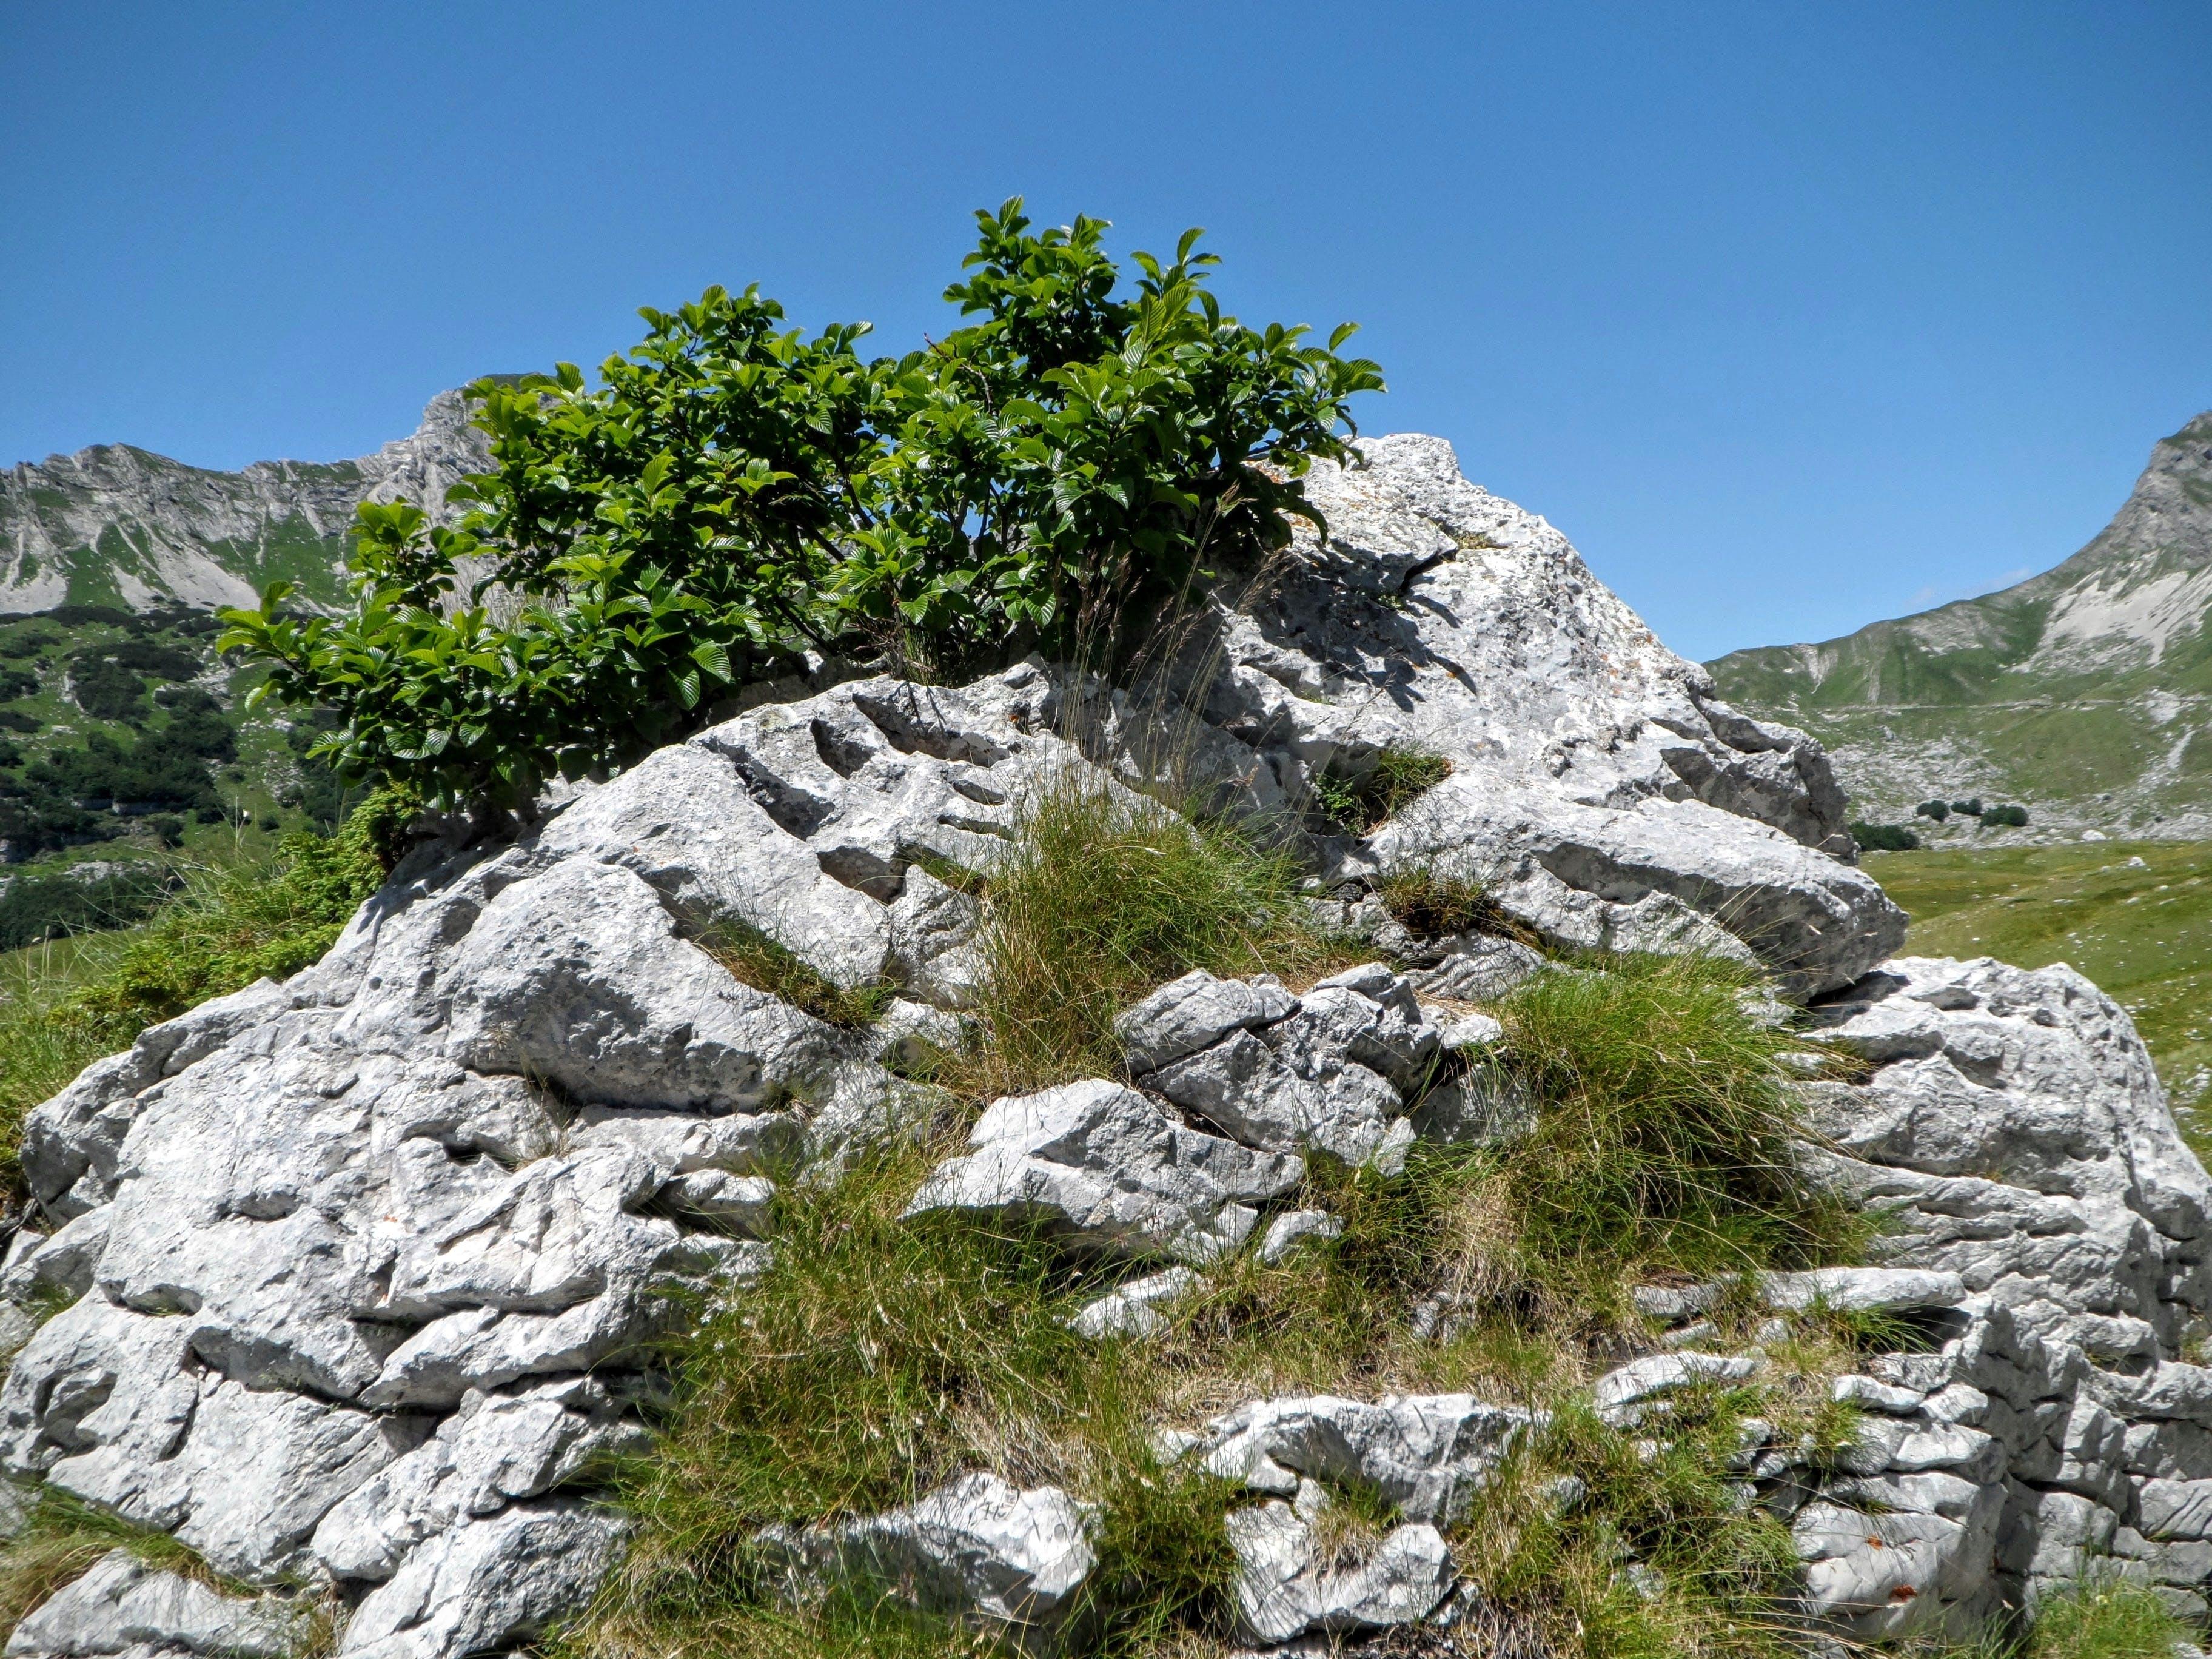 Free stock photo of blue sky, grass, limestone, plant